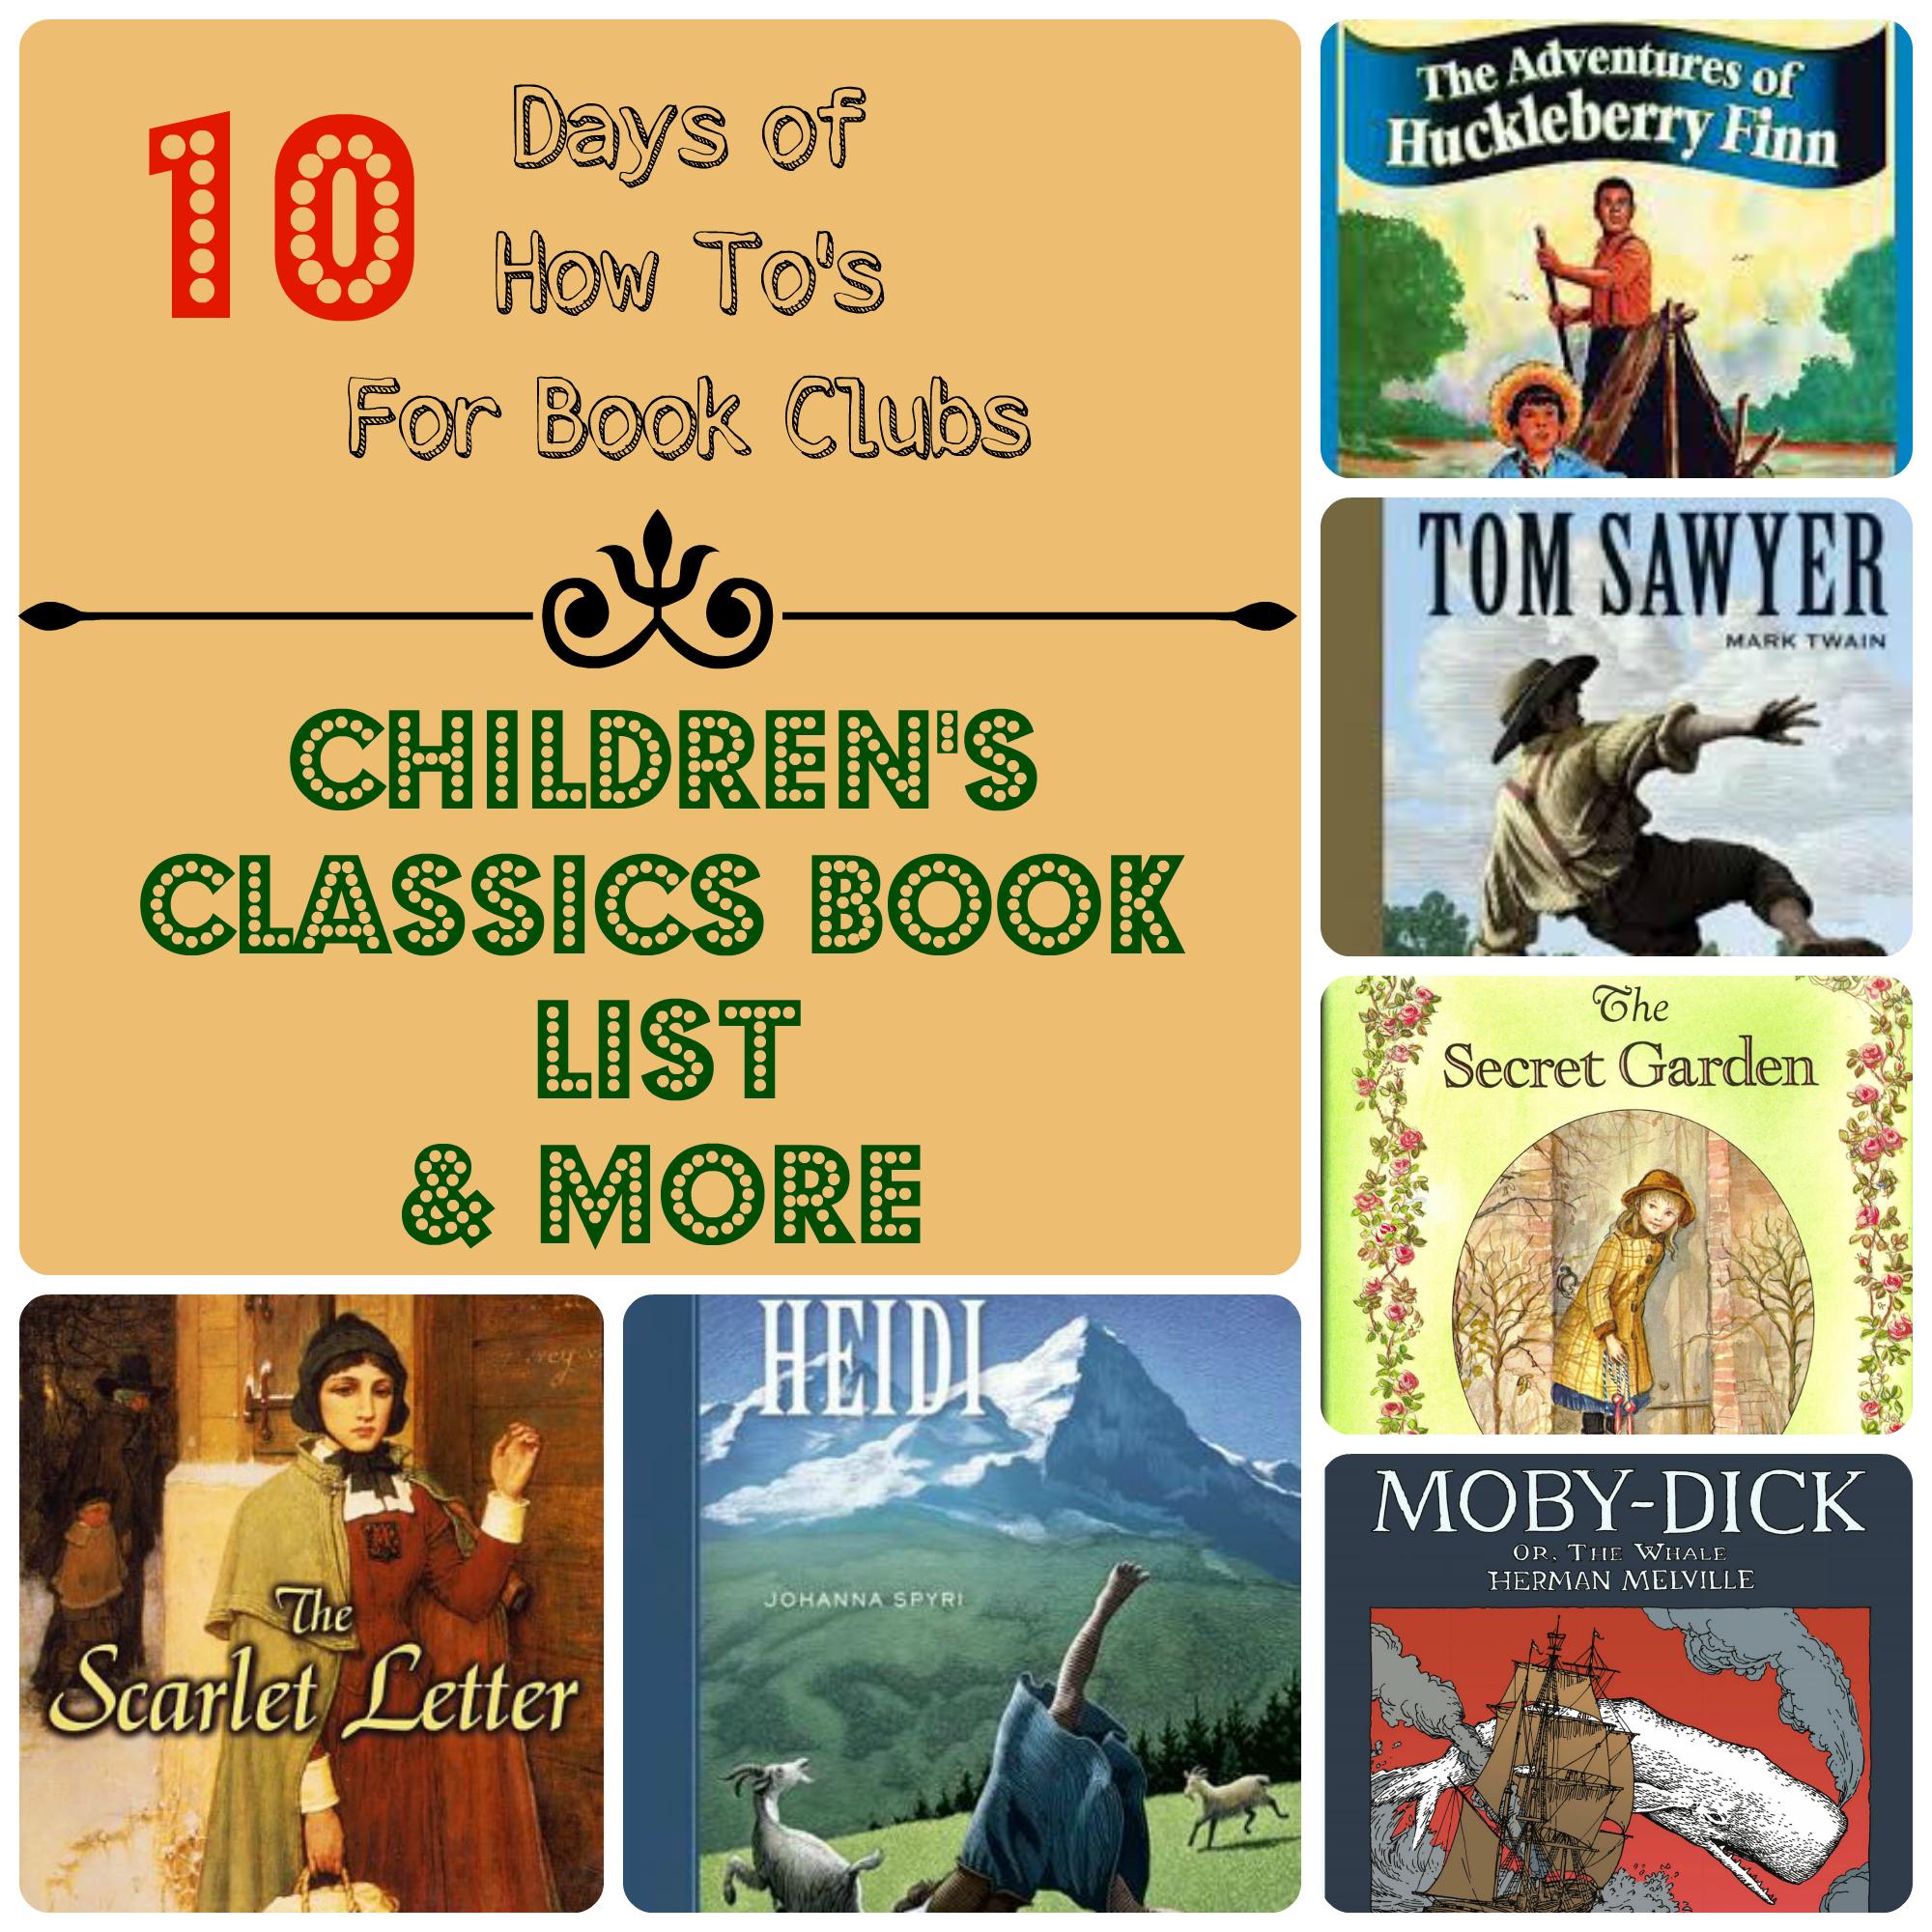 Classic Children S Book Cover ~ Childrens classics book list startsateight